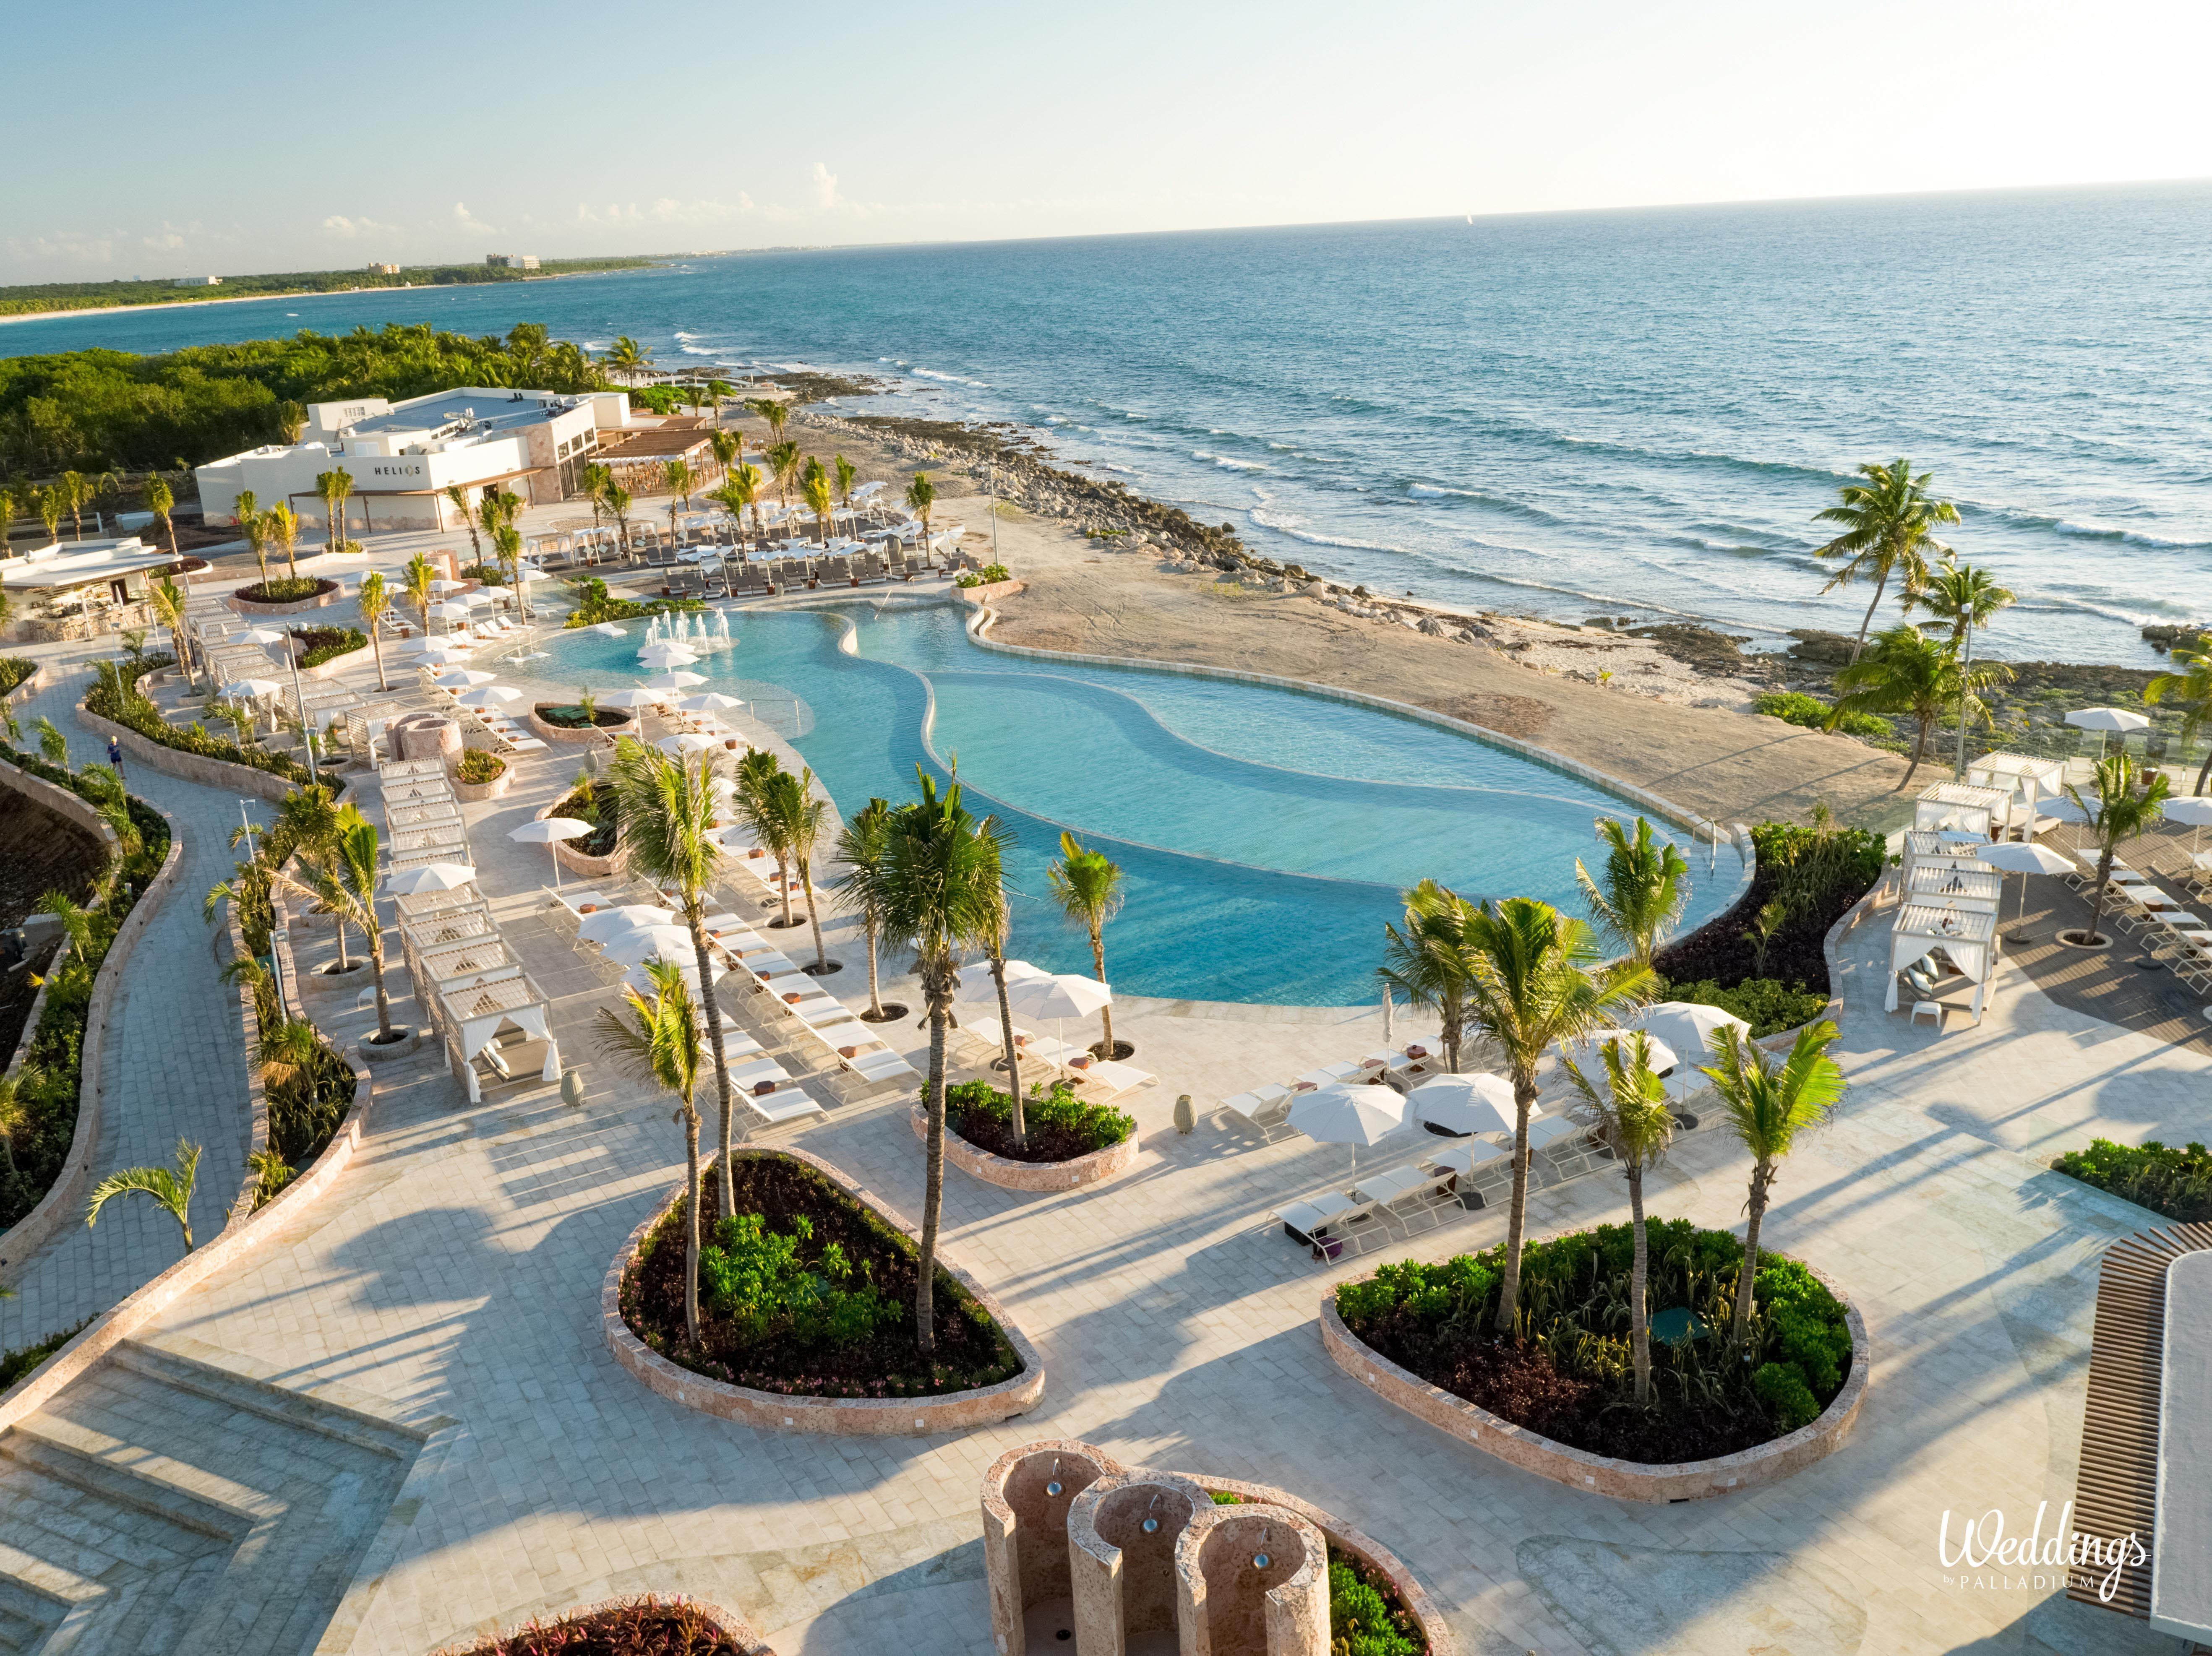 The Perfect Getaway Riviera Maya In 2021 The Perfect Getaway Riviera Maya Riviera Cancun